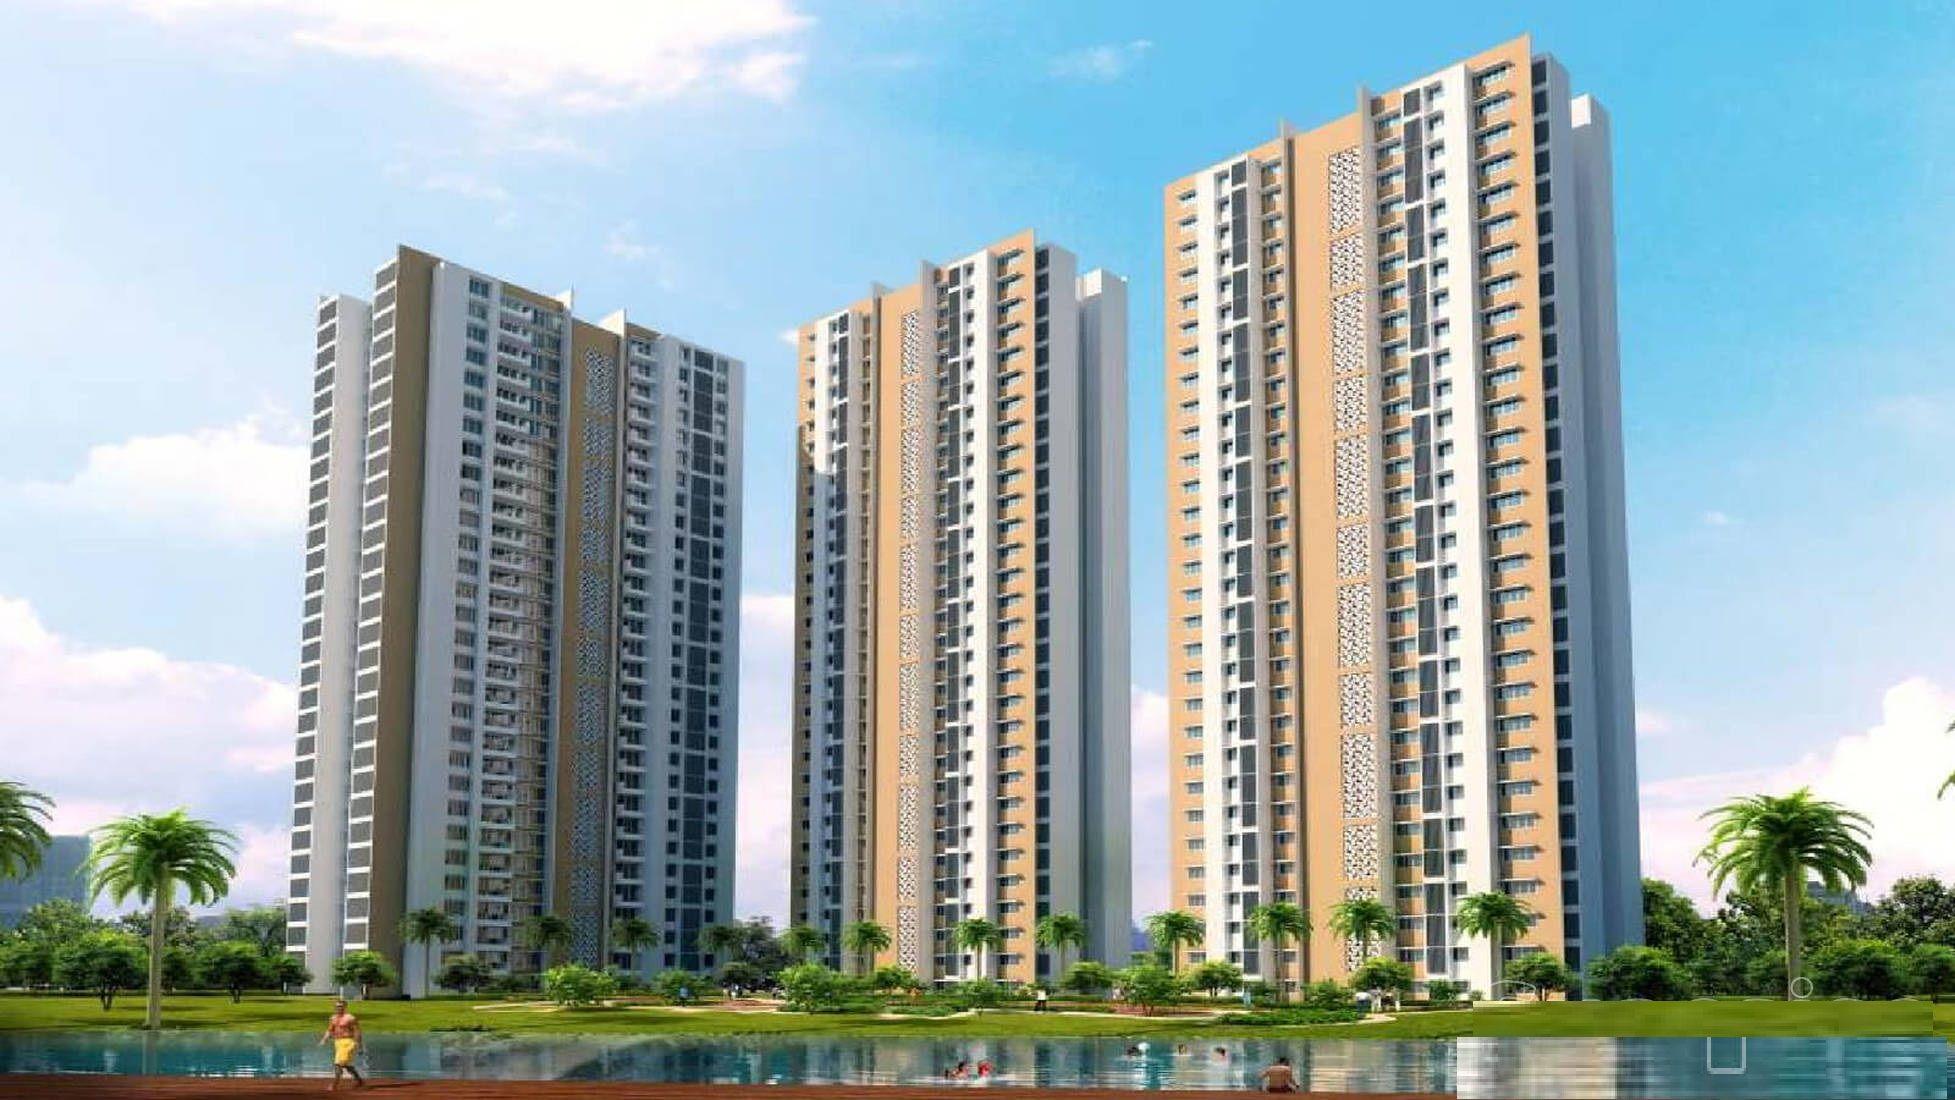 Maps Information And Comments For Lodha Majiwada New Apartment Thane Mumbai In Thane Mumbai On Travelful Net Hydroponics Aquaponics System Aquaponics